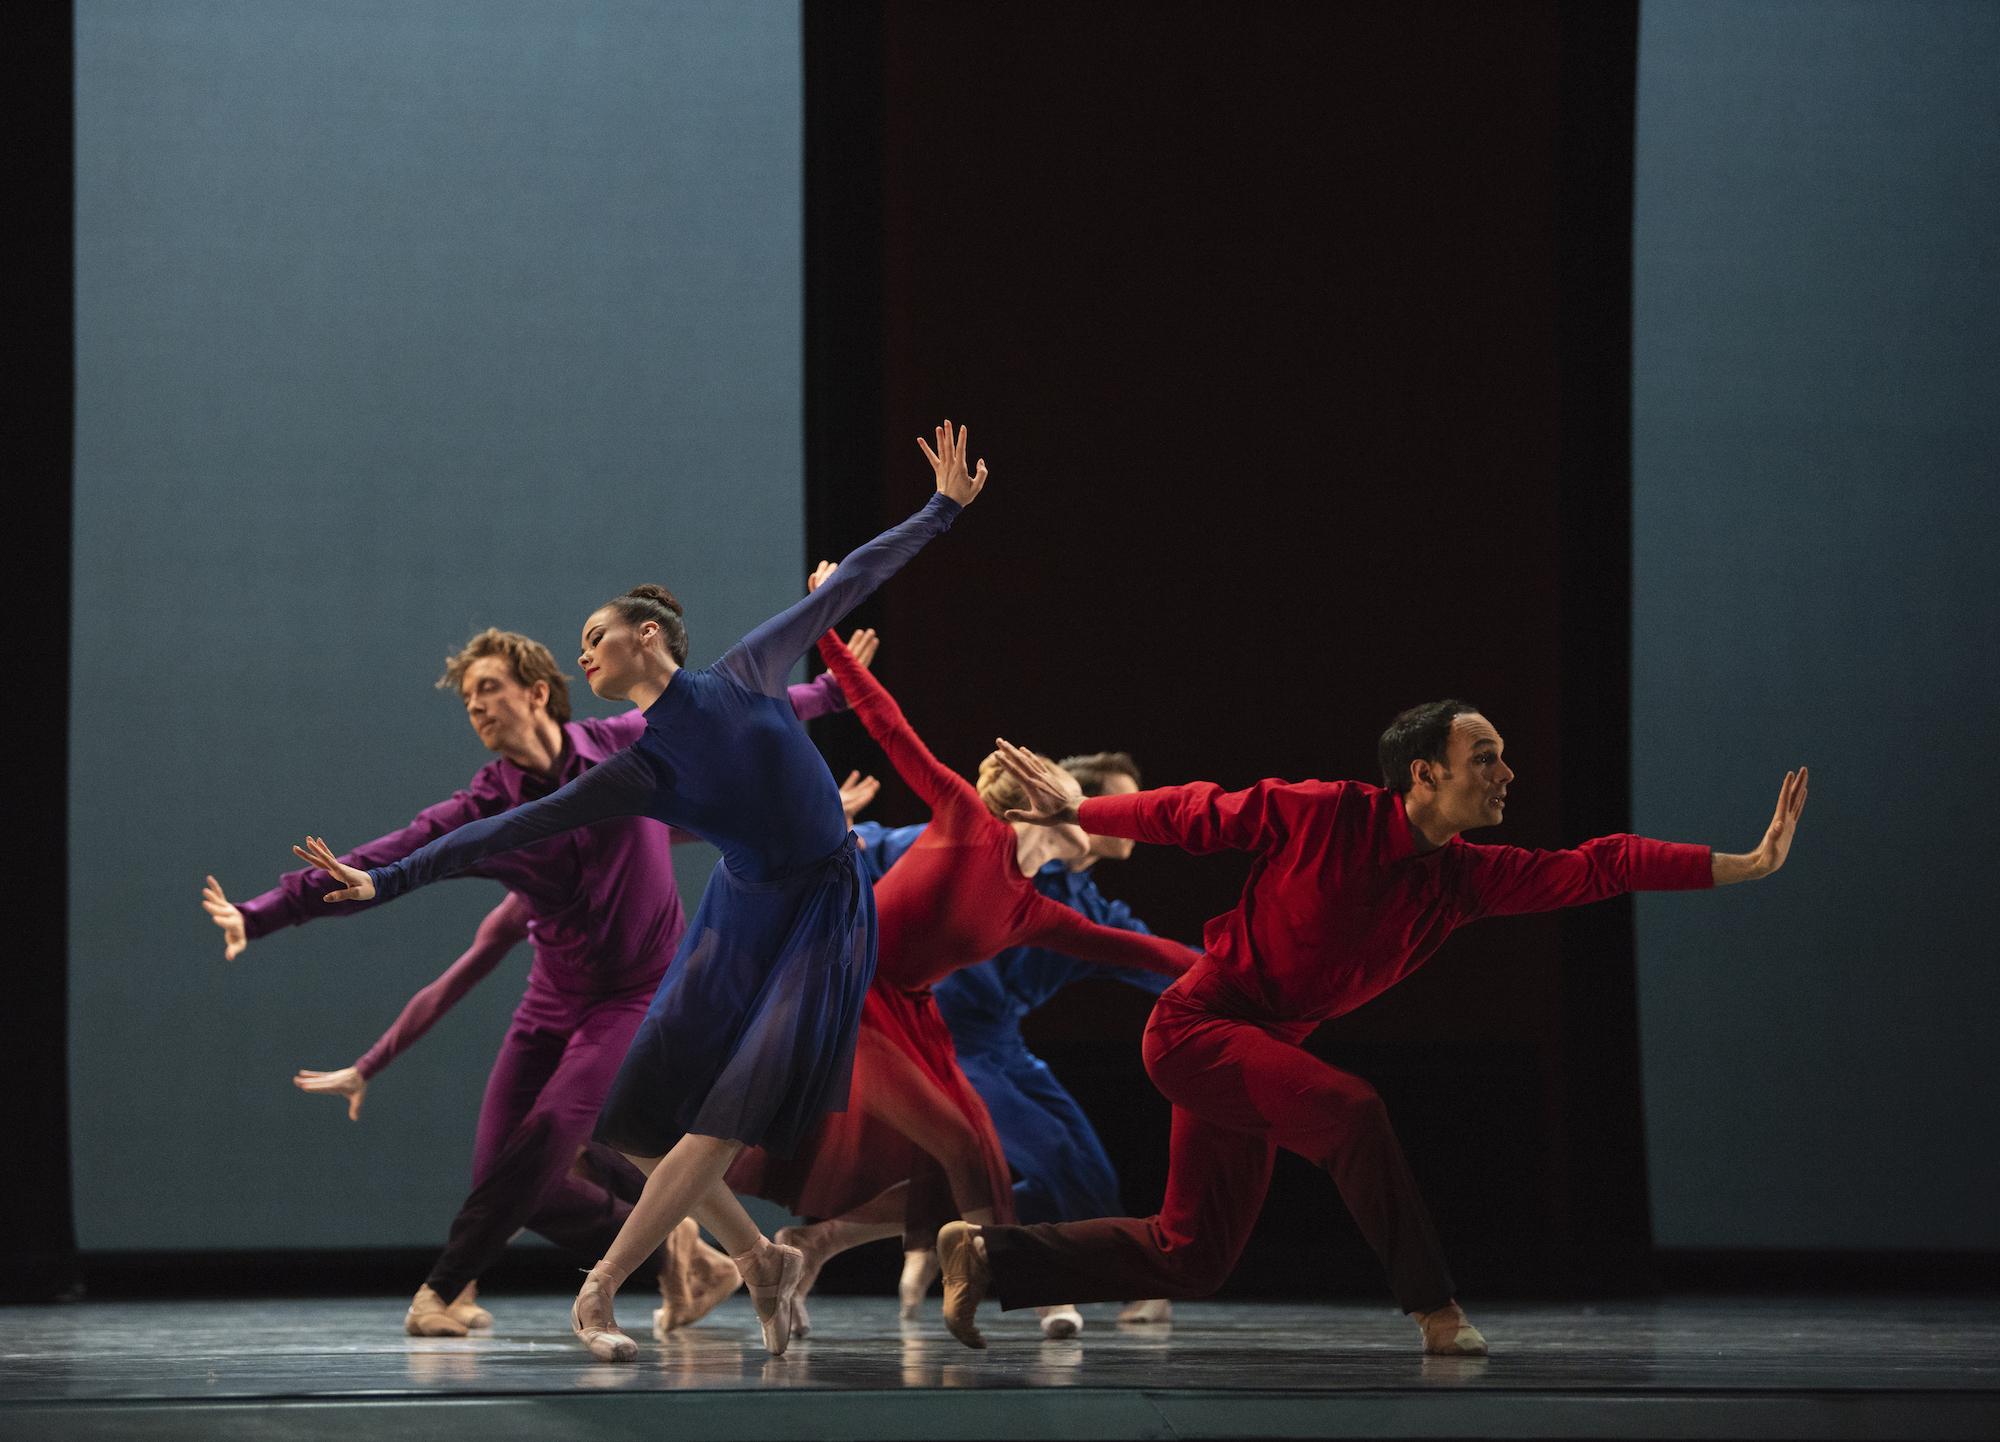 San Francisco Ballet in Millepied's Appassionata. (© Erik Tomasson)